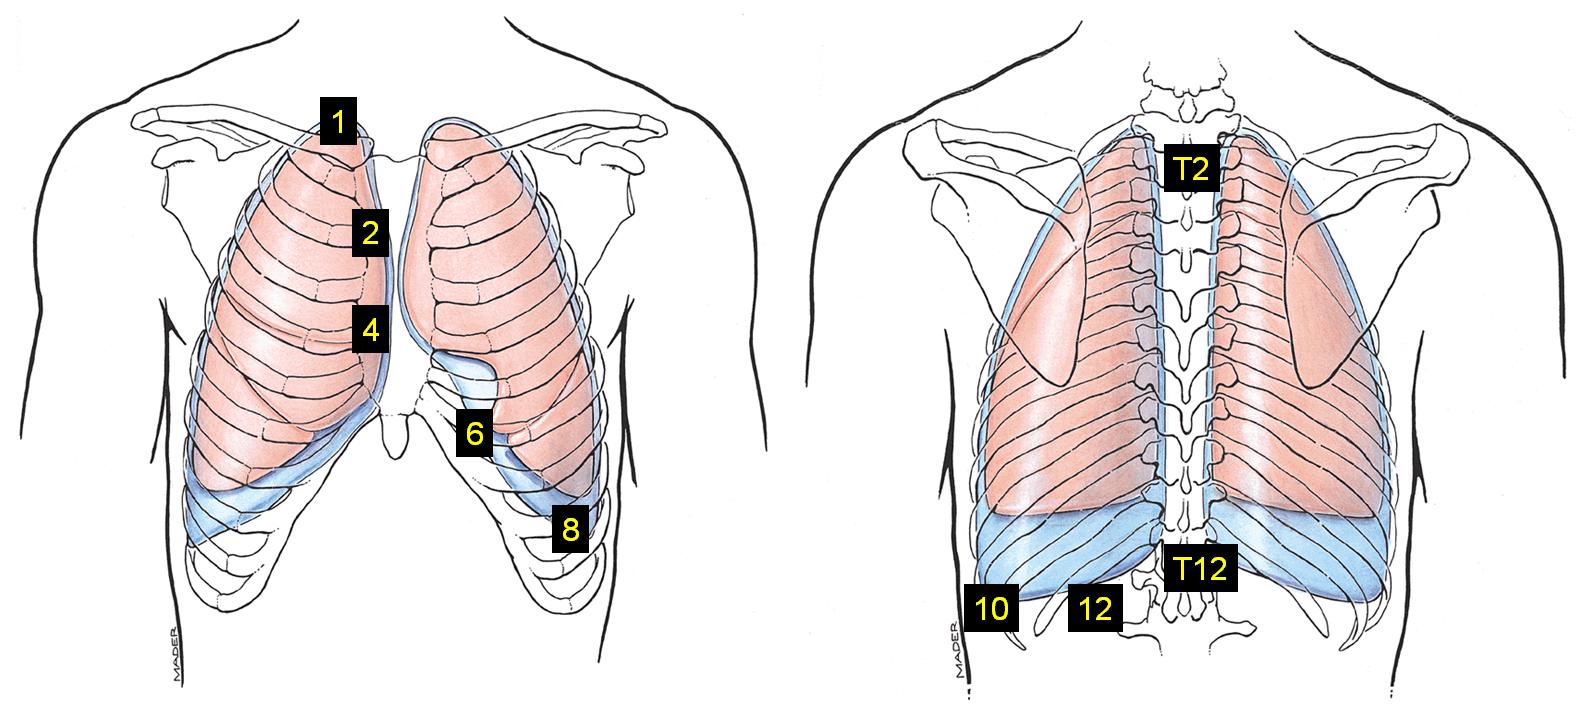 1.01 - Thoracic Cage, Diaphragm, Pleura, Lungs (Anatomy, Robert ...